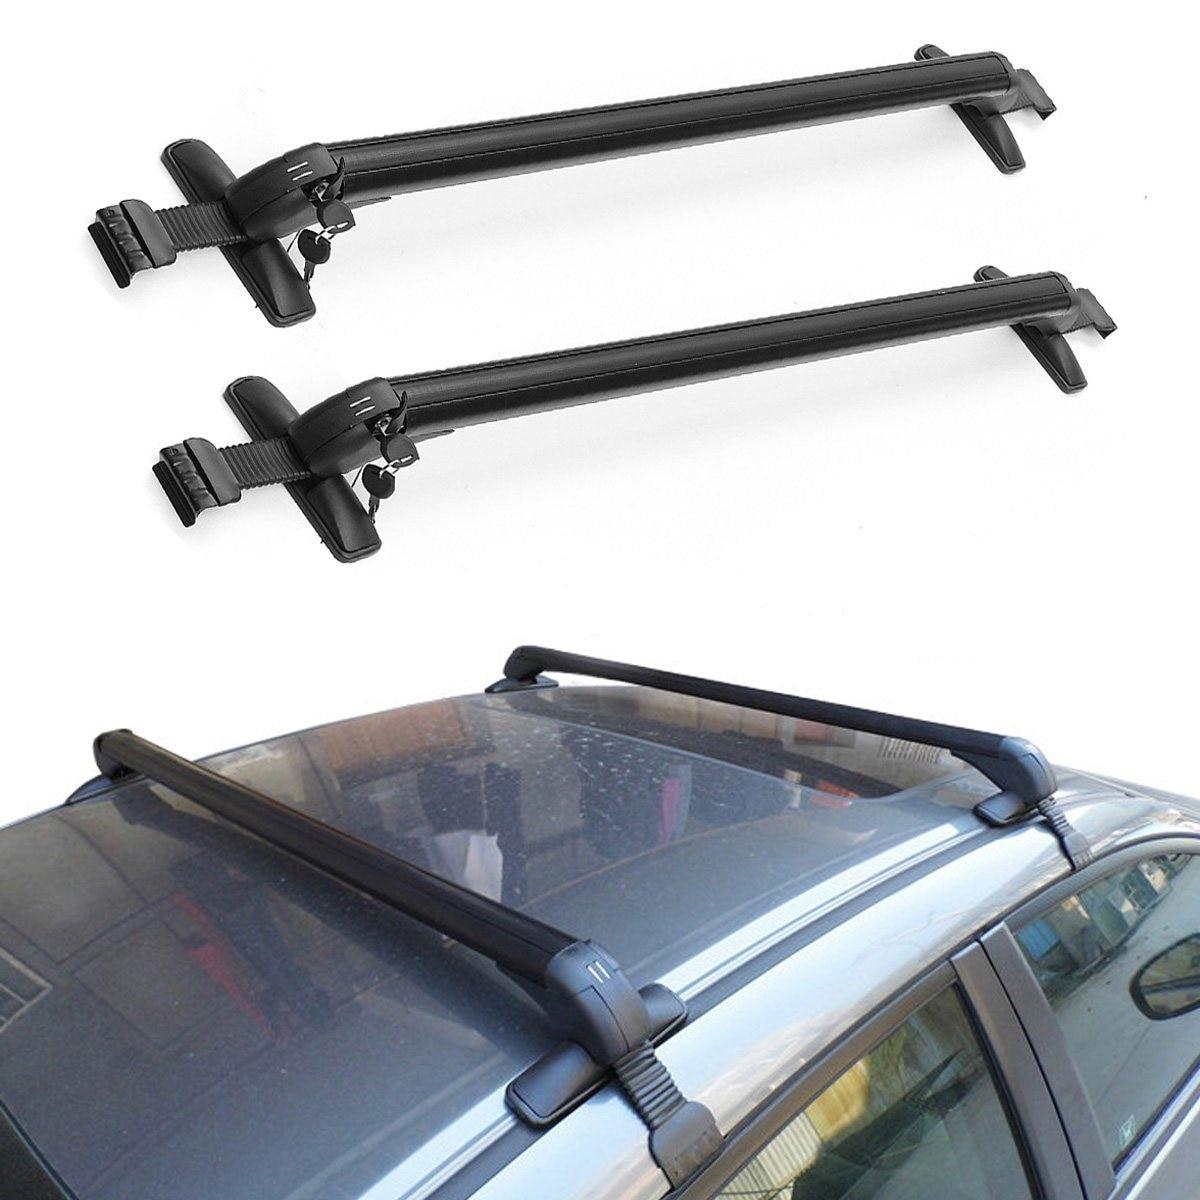 Universal Car Roof Cross Bar Anti Theft Lockable Bars Roof